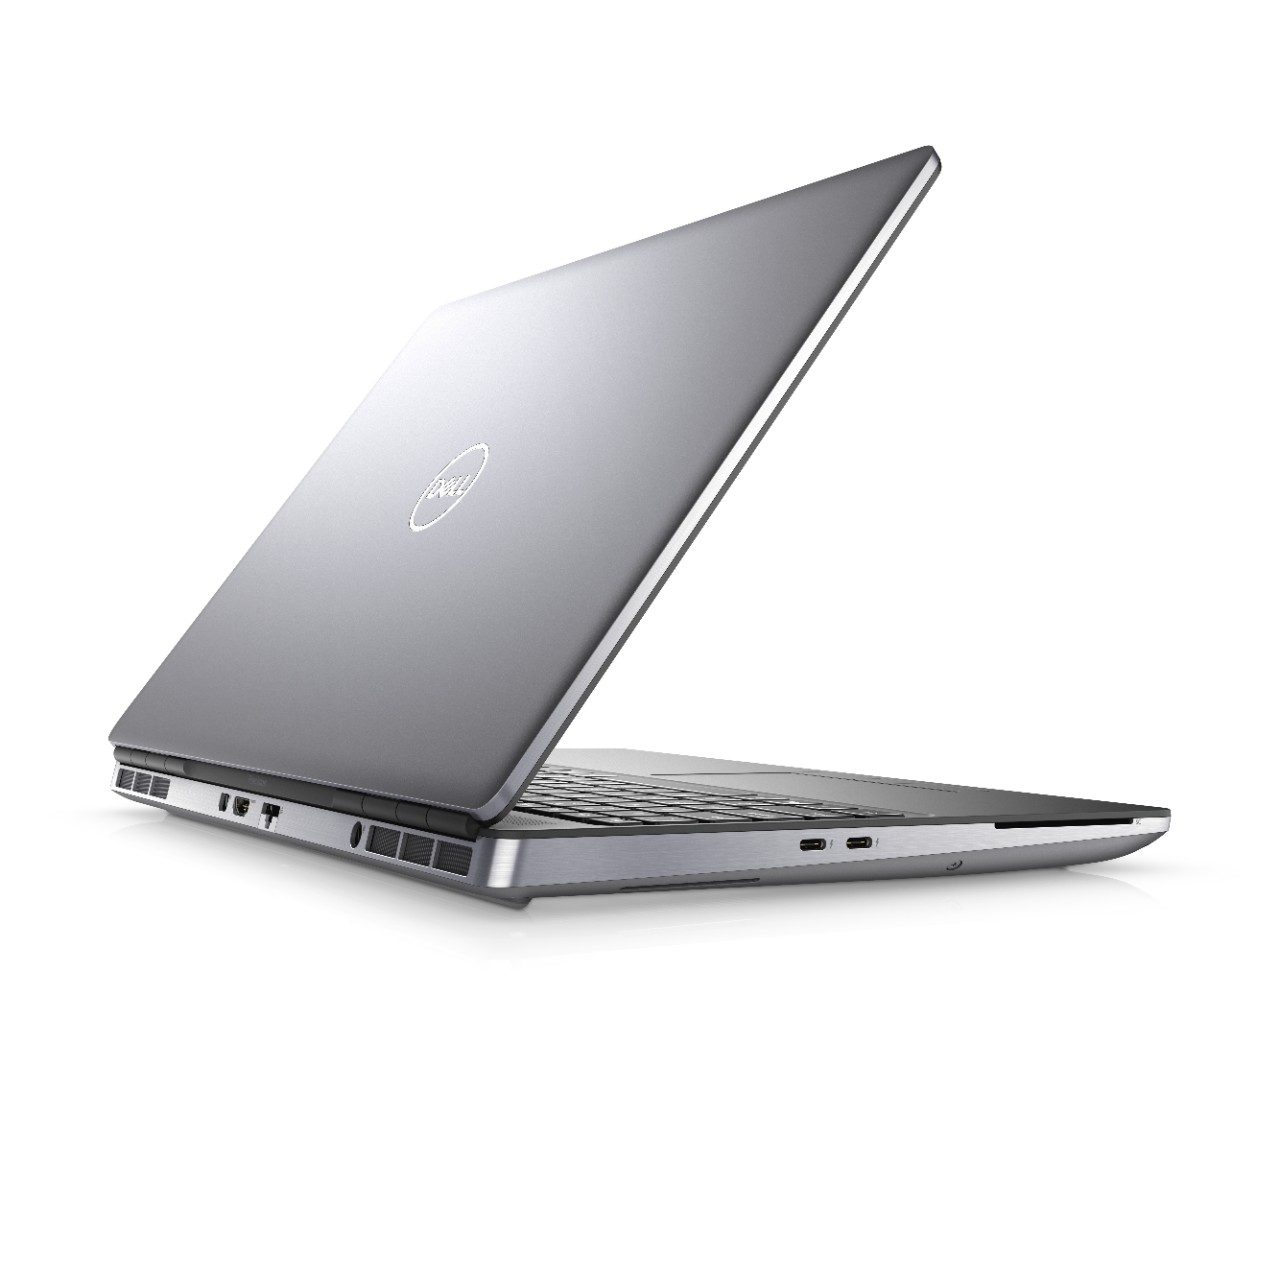 Dell Precision 7550 15,6'' FHD i7-10850H/16GB/512GB SSD/T2000-4GB/THB/MCR/SCR/LTE/W10P/3RNBD/Šedý - MFFHC